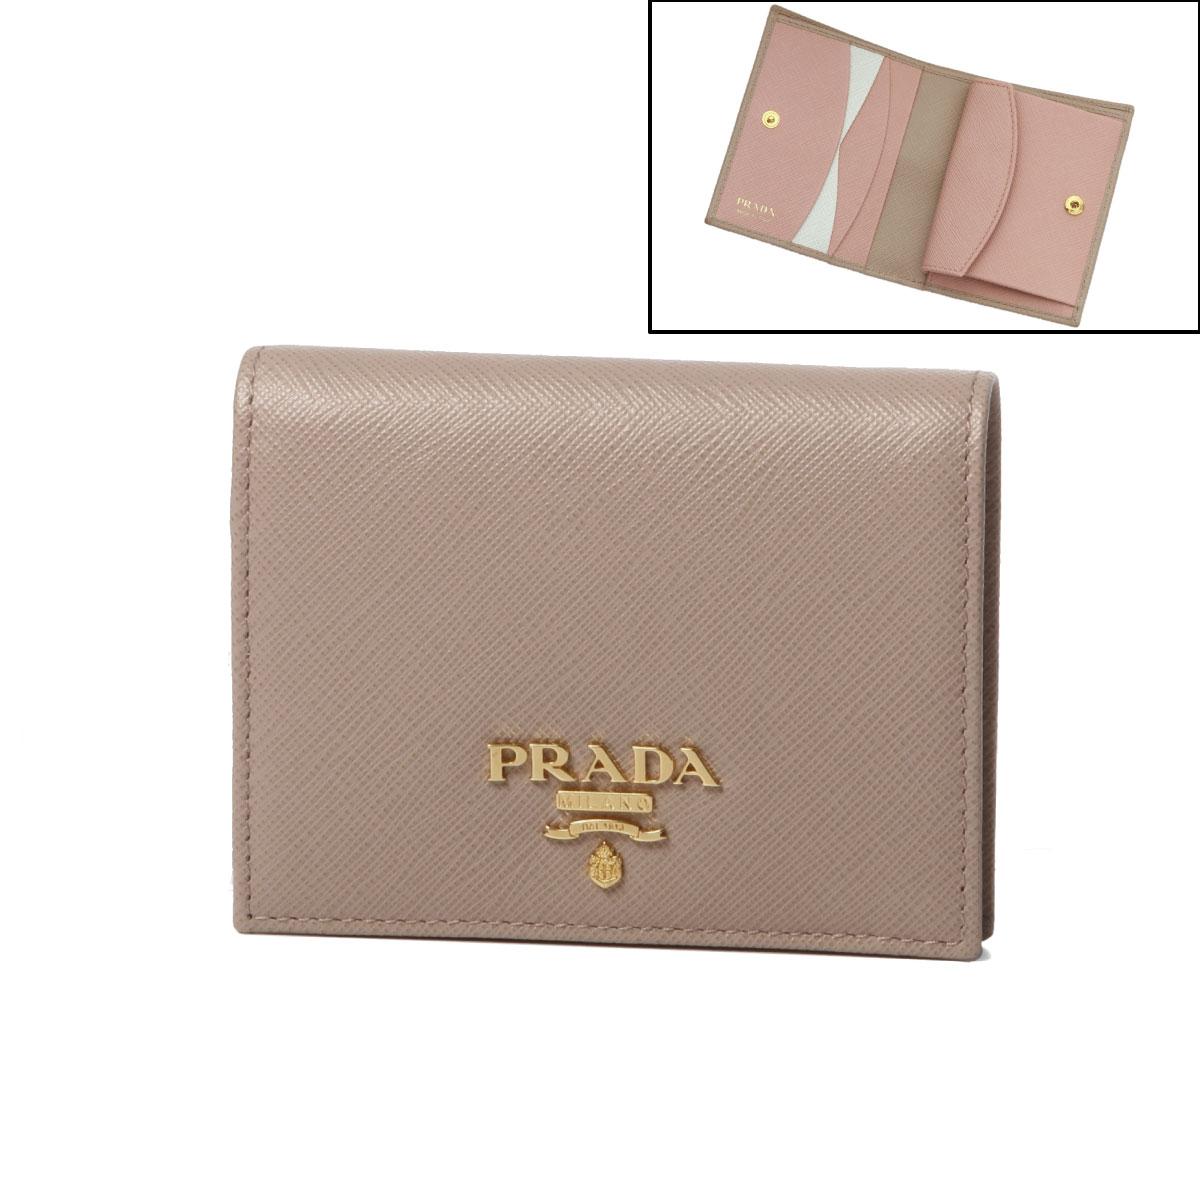 7220d9b9fc46 Prada PRADA wallet Lady's 1MV204 ZLP F0TTV folio wallet SAFFIANO MULTIC  CIPRIA+ORCHIDEA beige ...